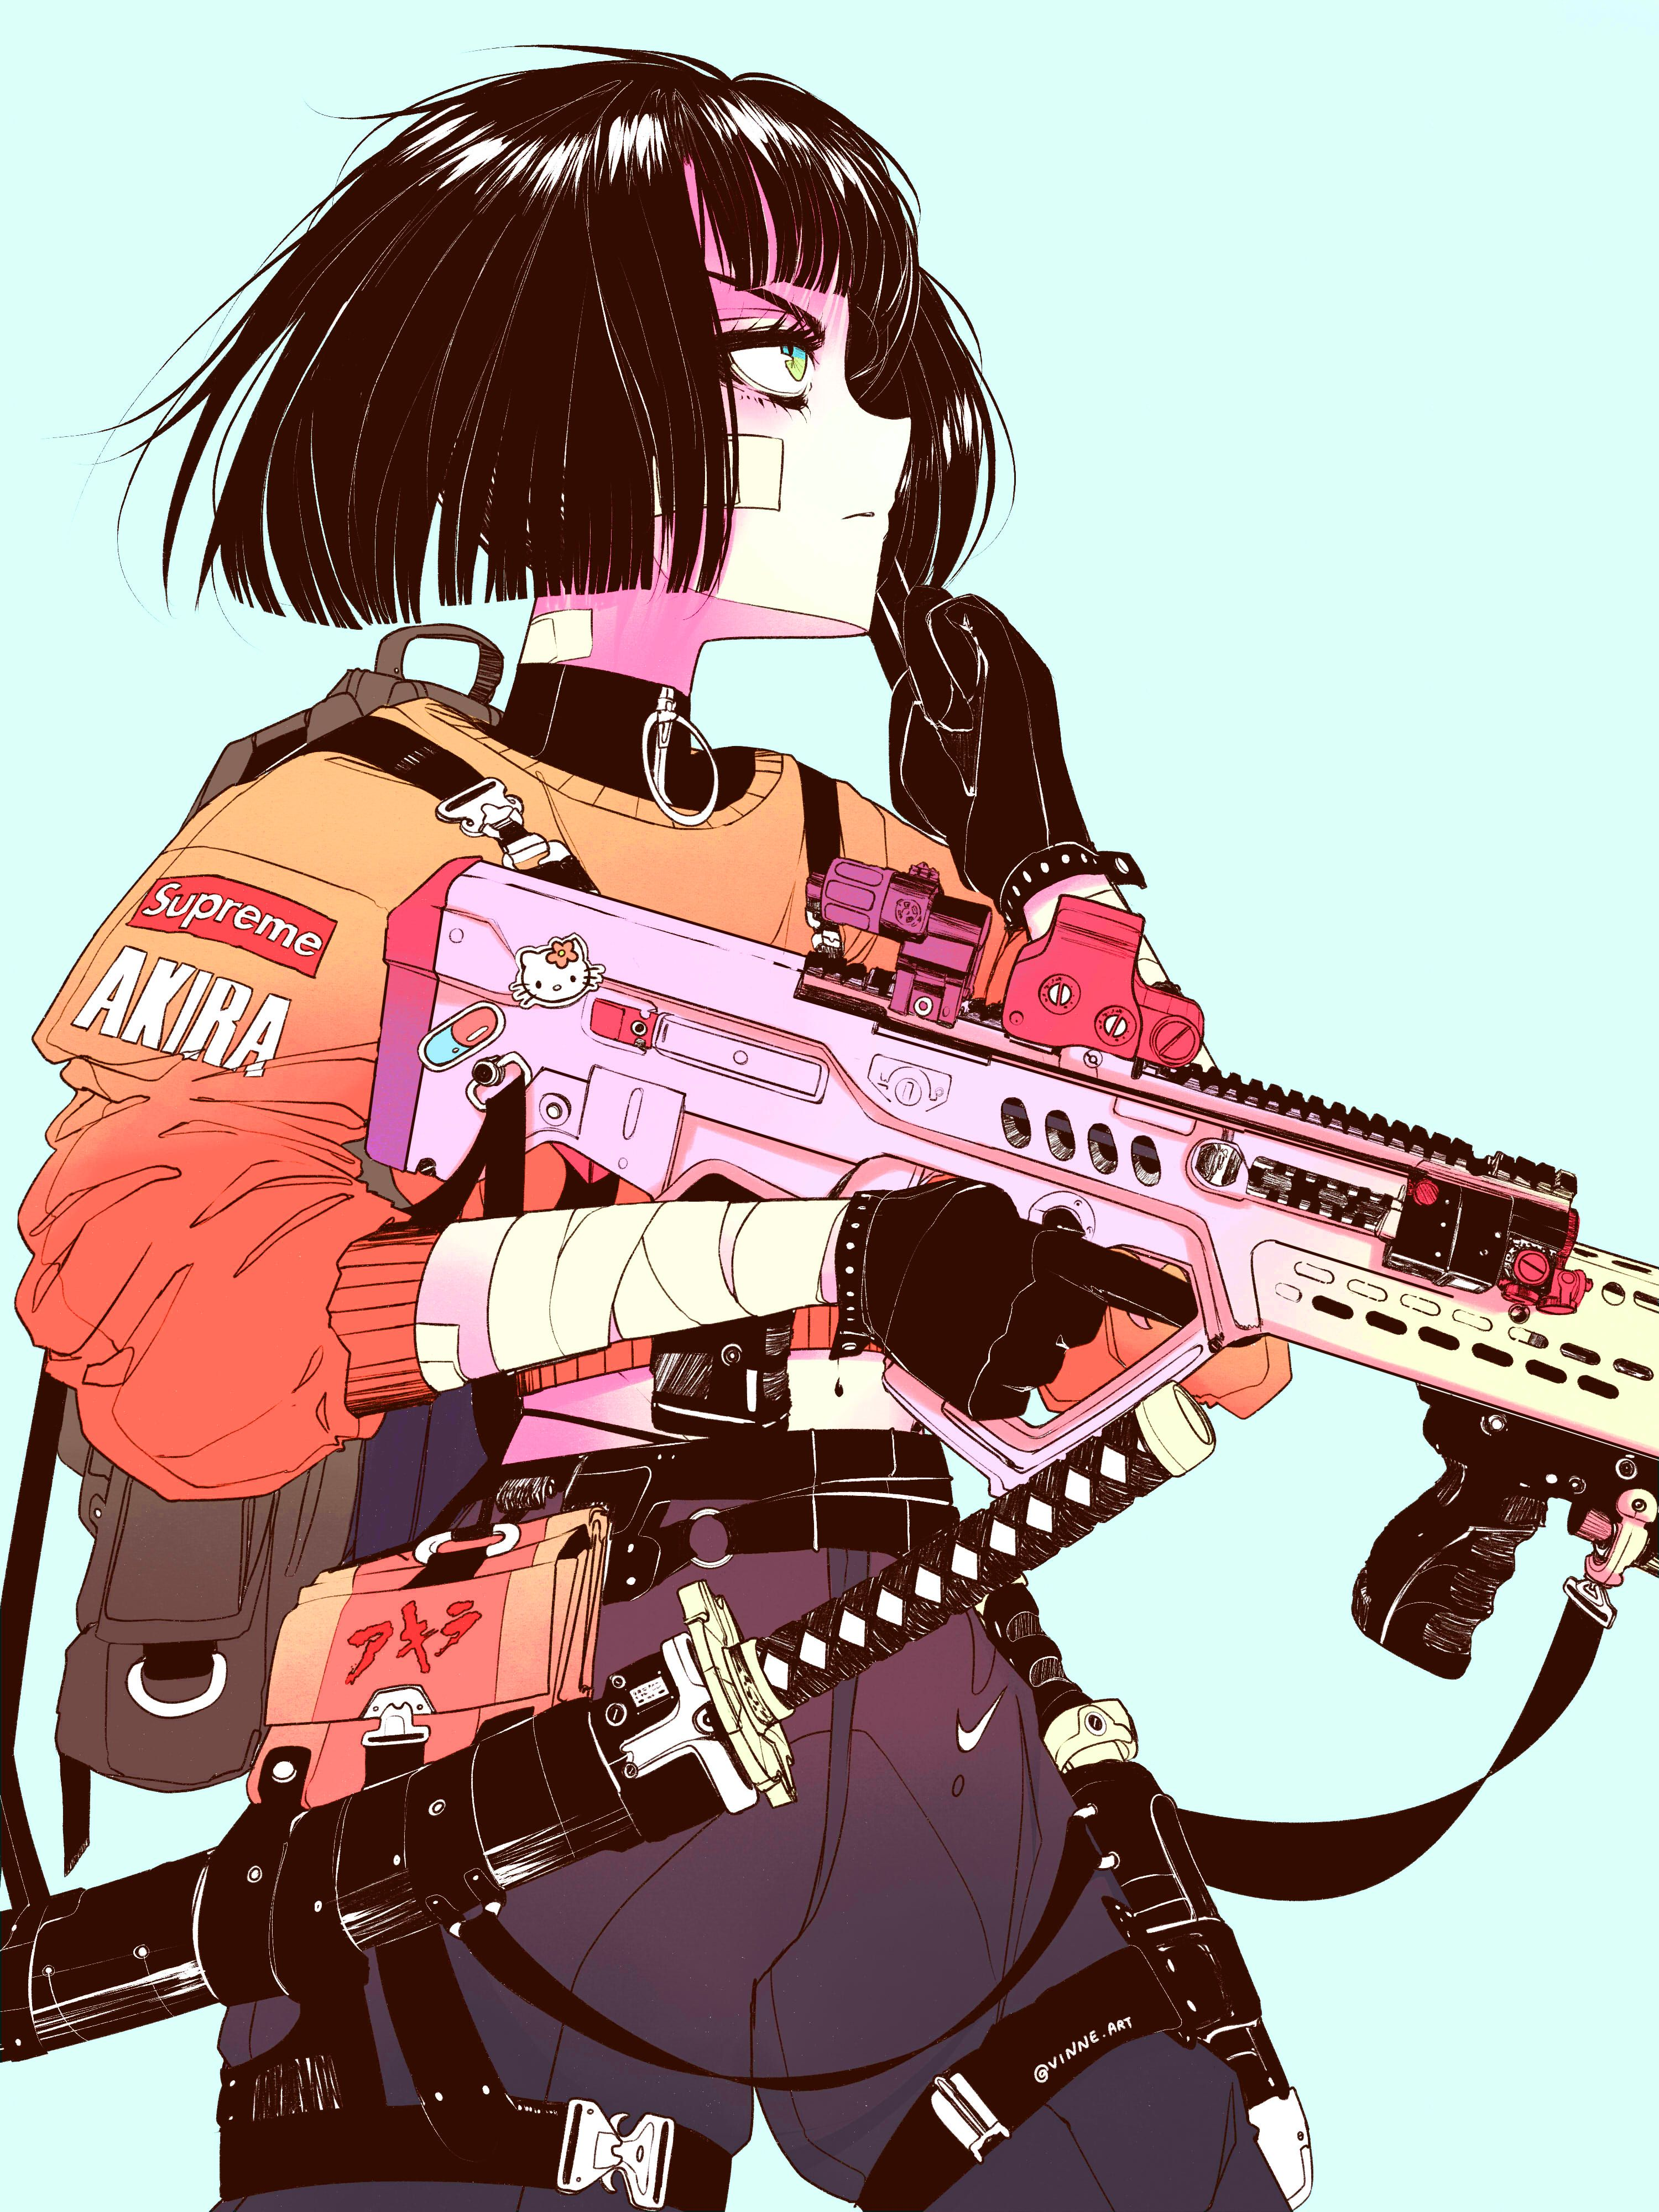 Pin by Terence Tolman on vinne Cyberpunk art, Character art